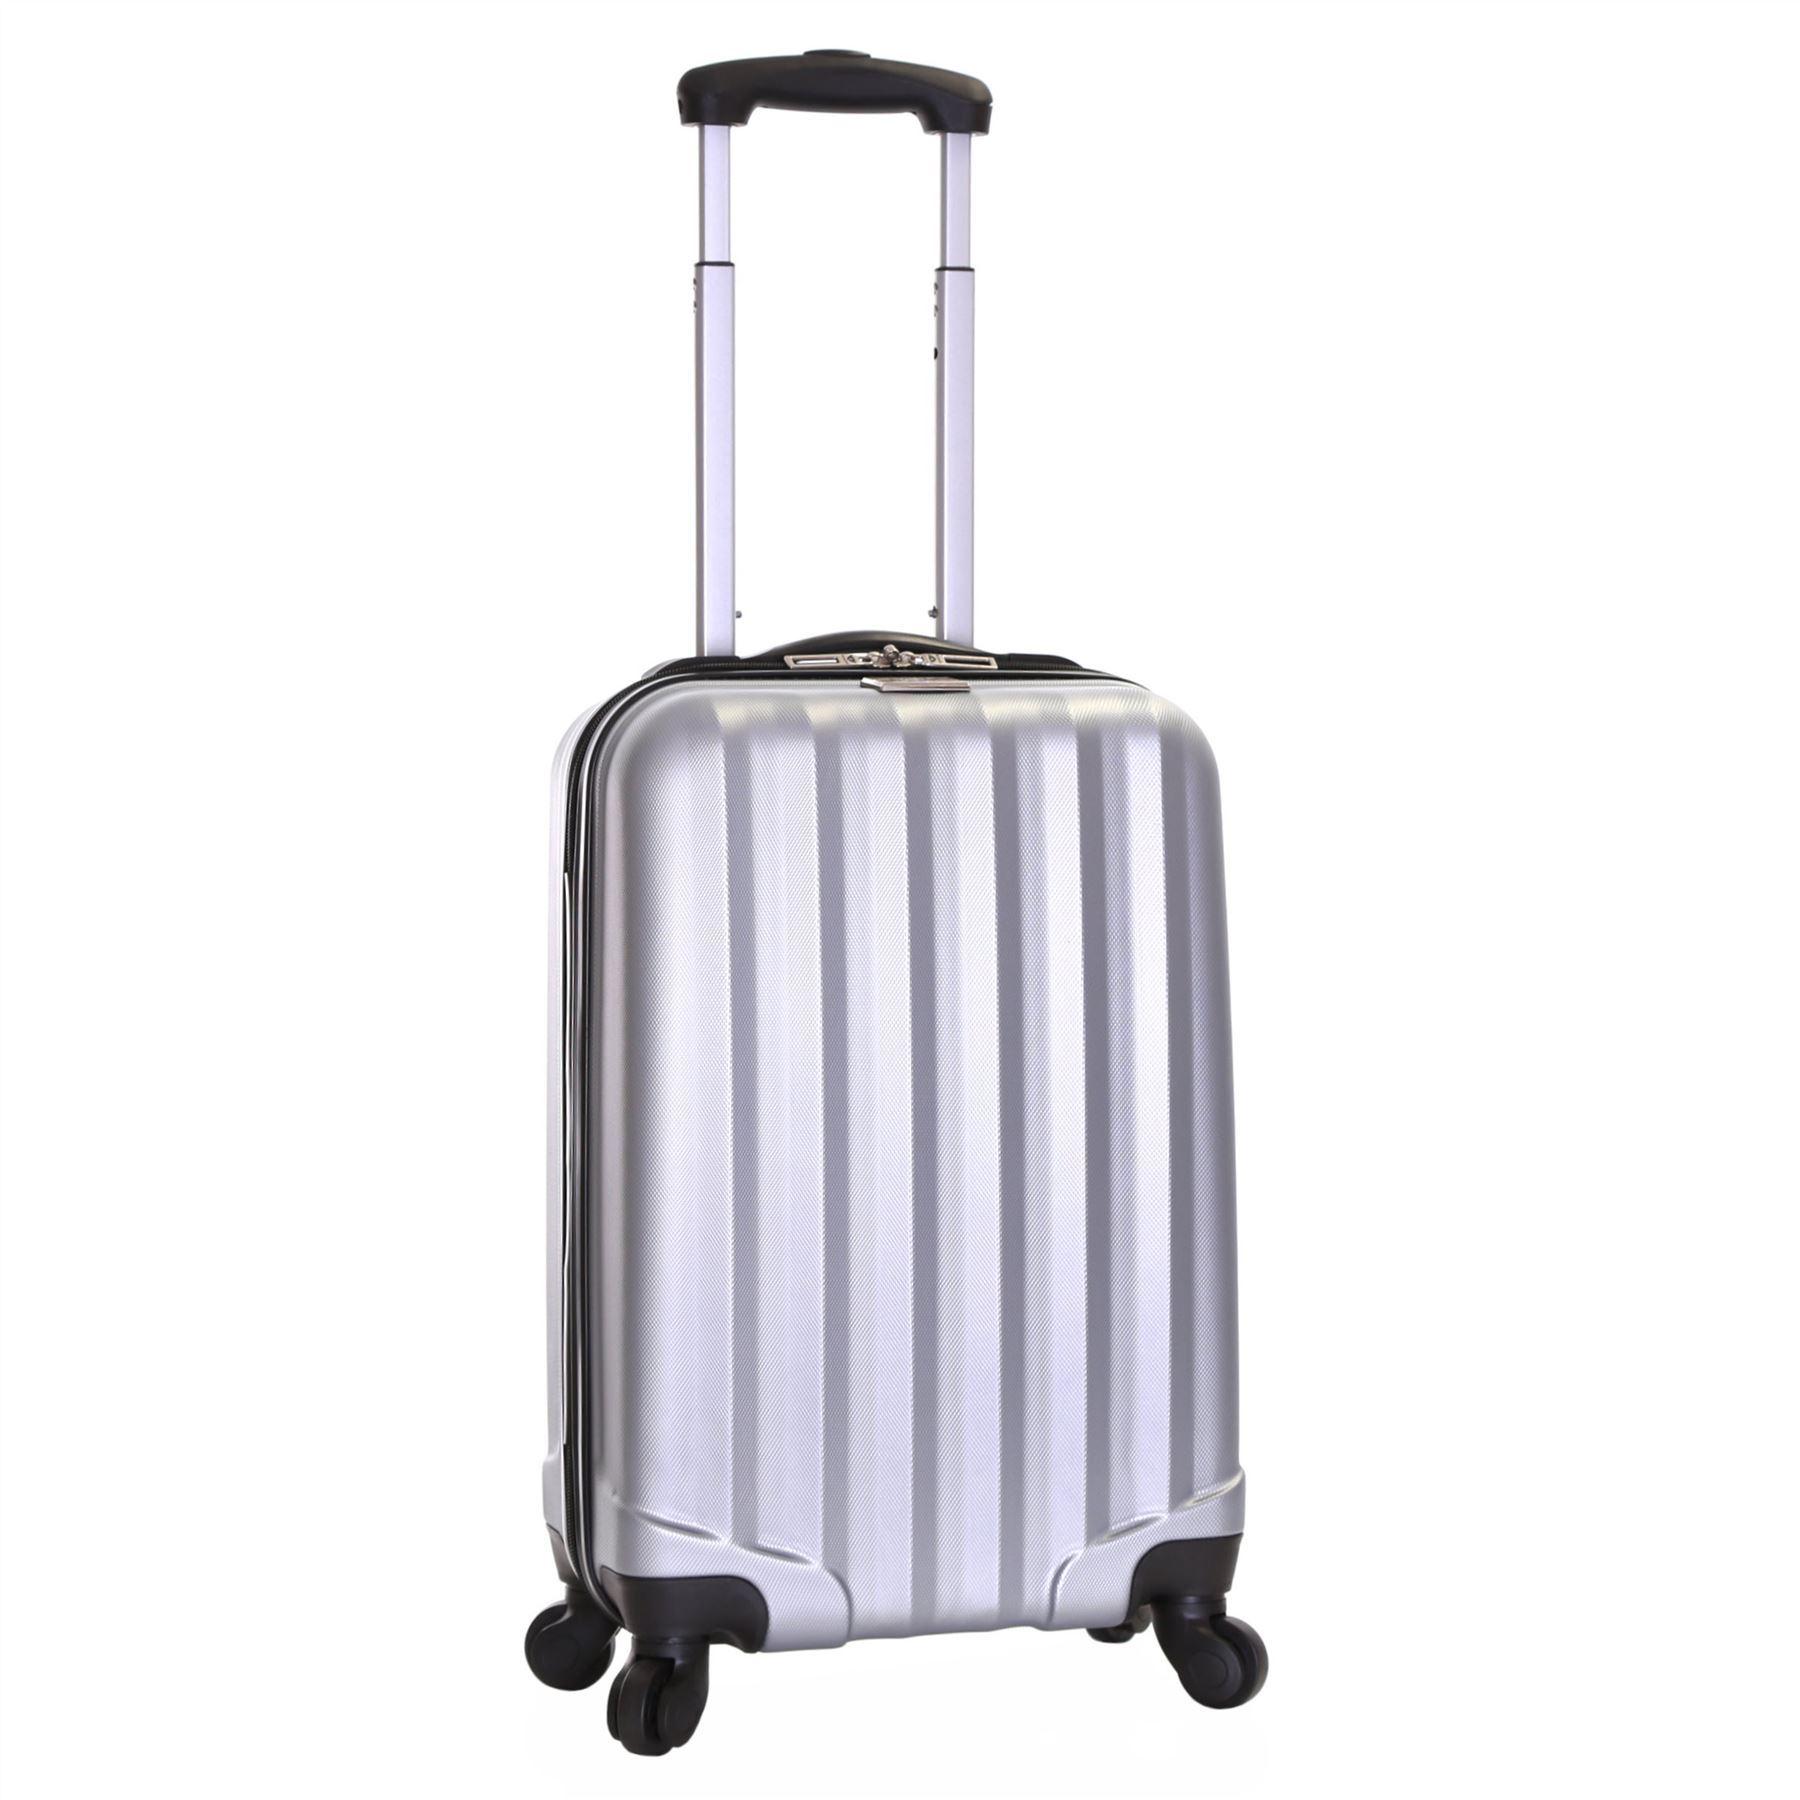 ryanair hard side cabin approved spinner trolley hand luggage suitcase bag case ebay. Black Bedroom Furniture Sets. Home Design Ideas